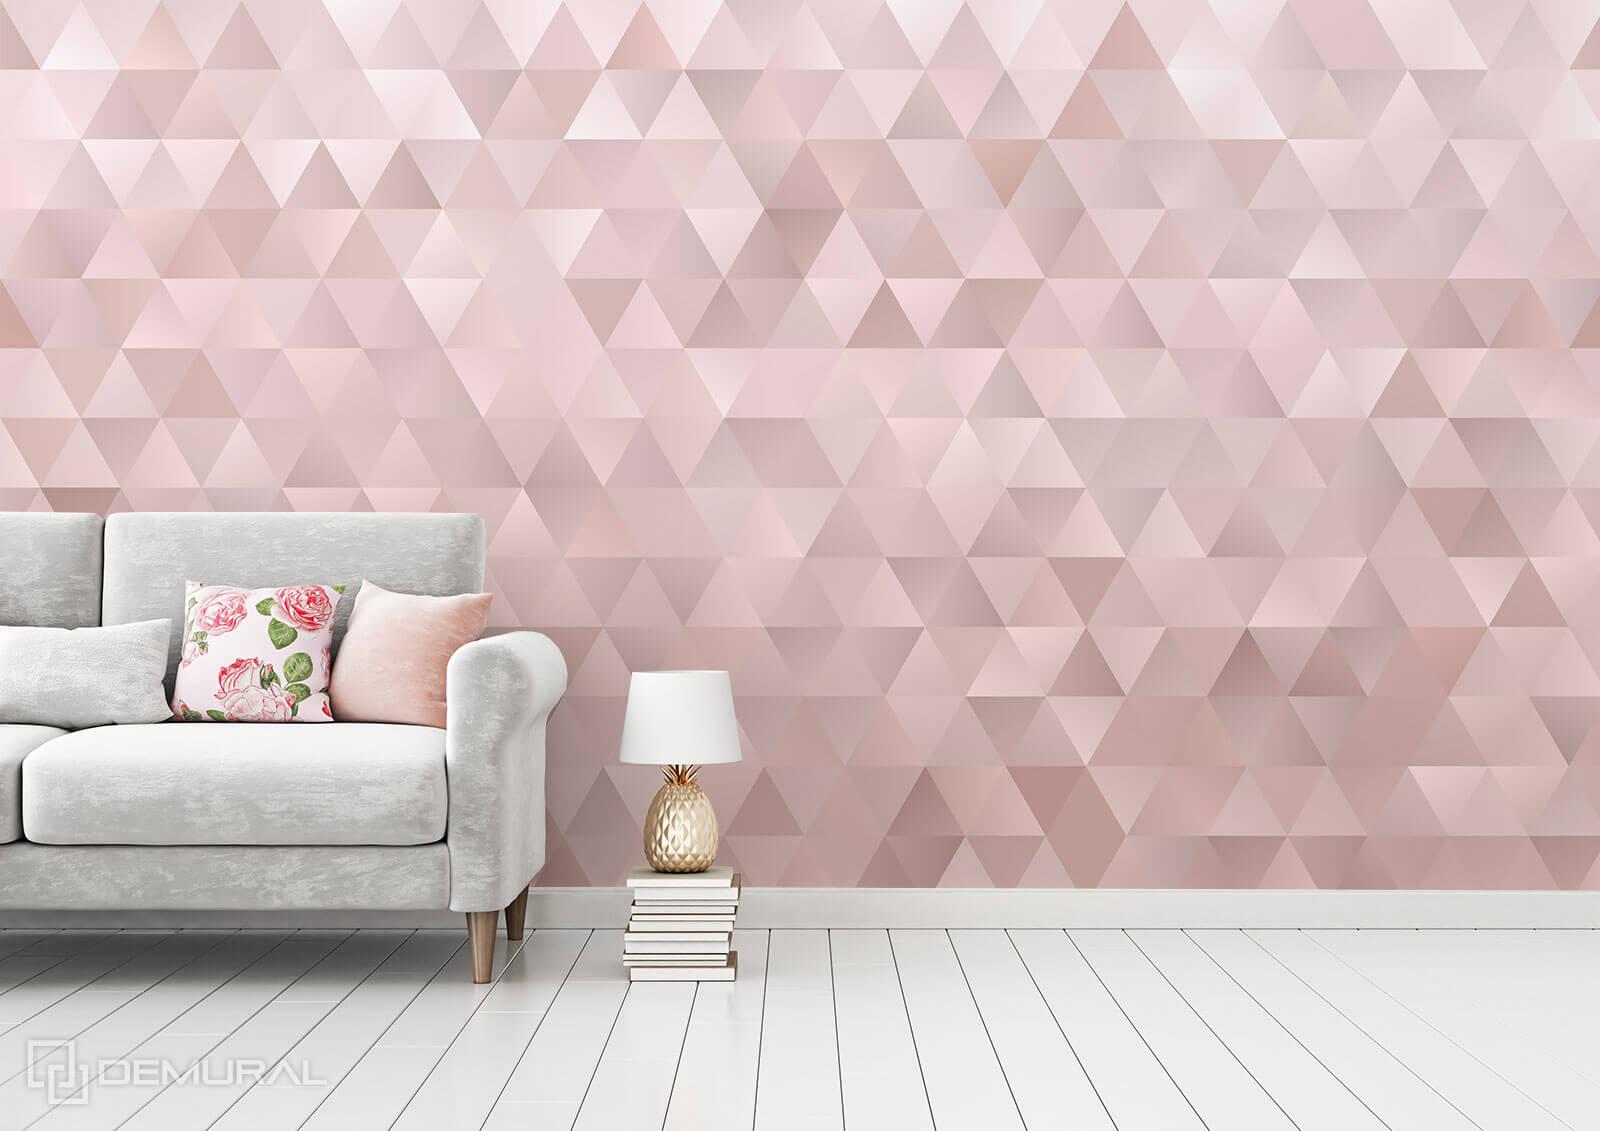 Photo wallpaper Pink triangles - Pink photo wallpaper - Demural